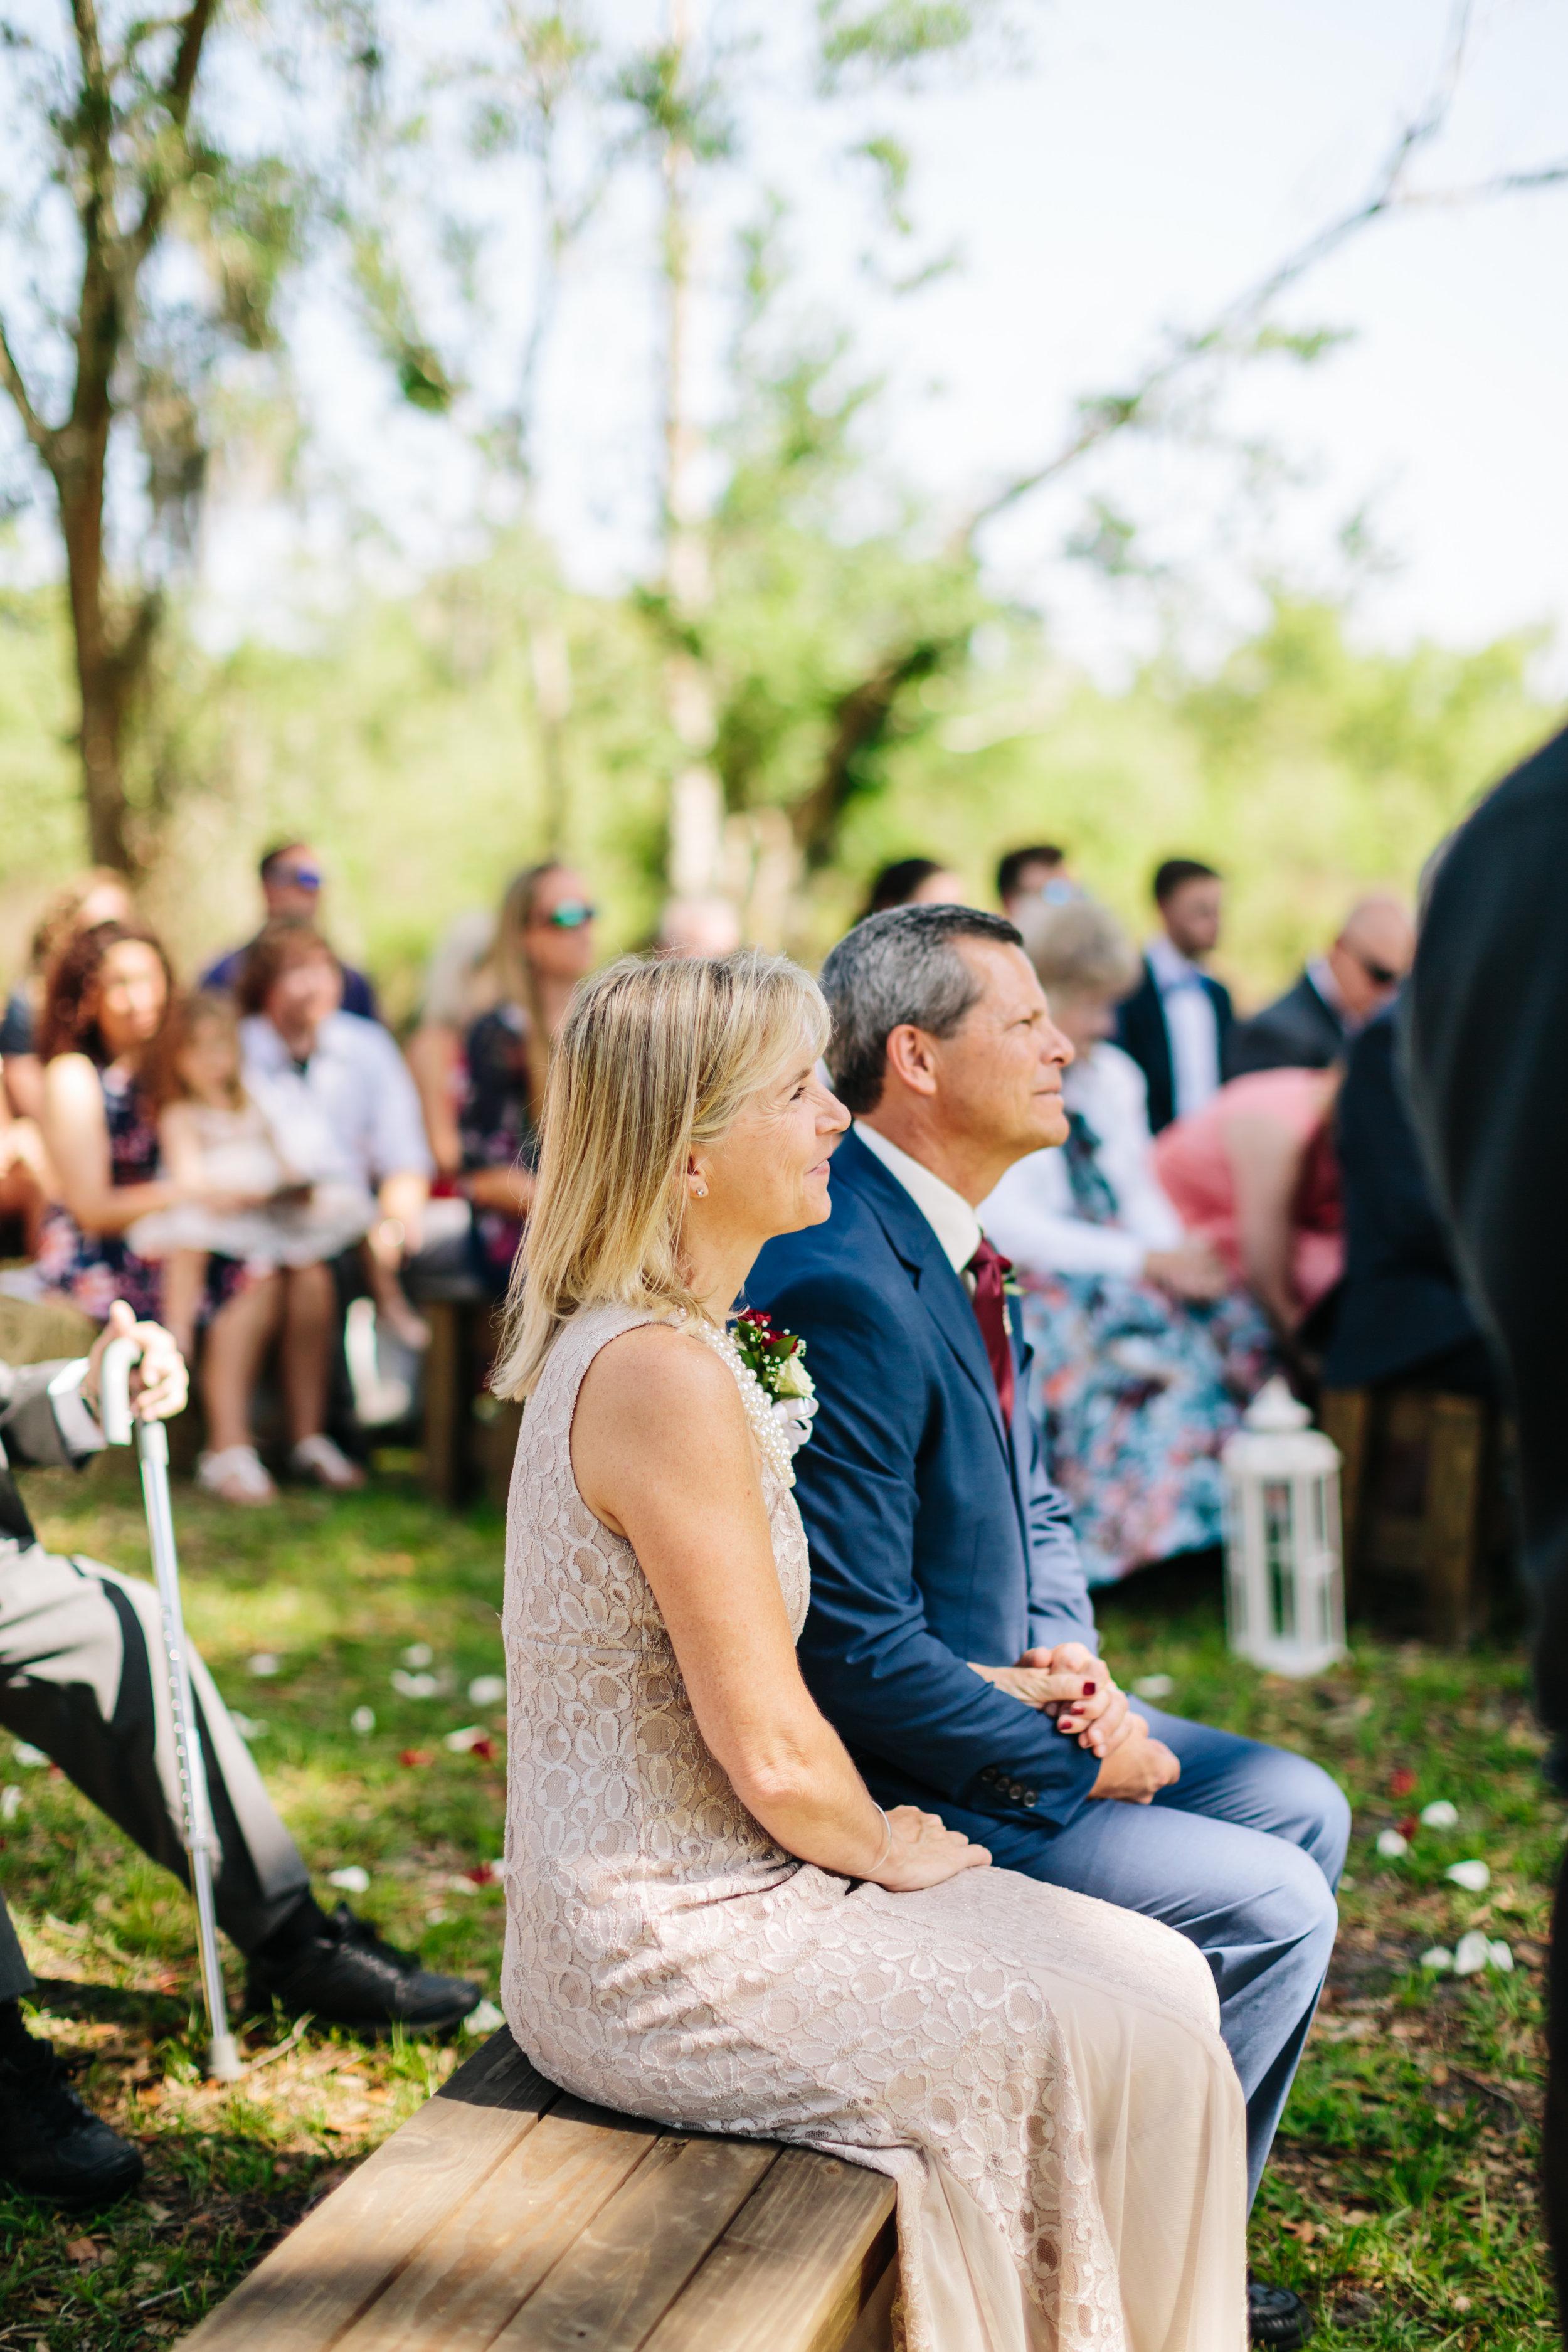 2018.04.14 Zak and Jamisyn Unrue Black Willow Barn Wedding Finals-371.jpg